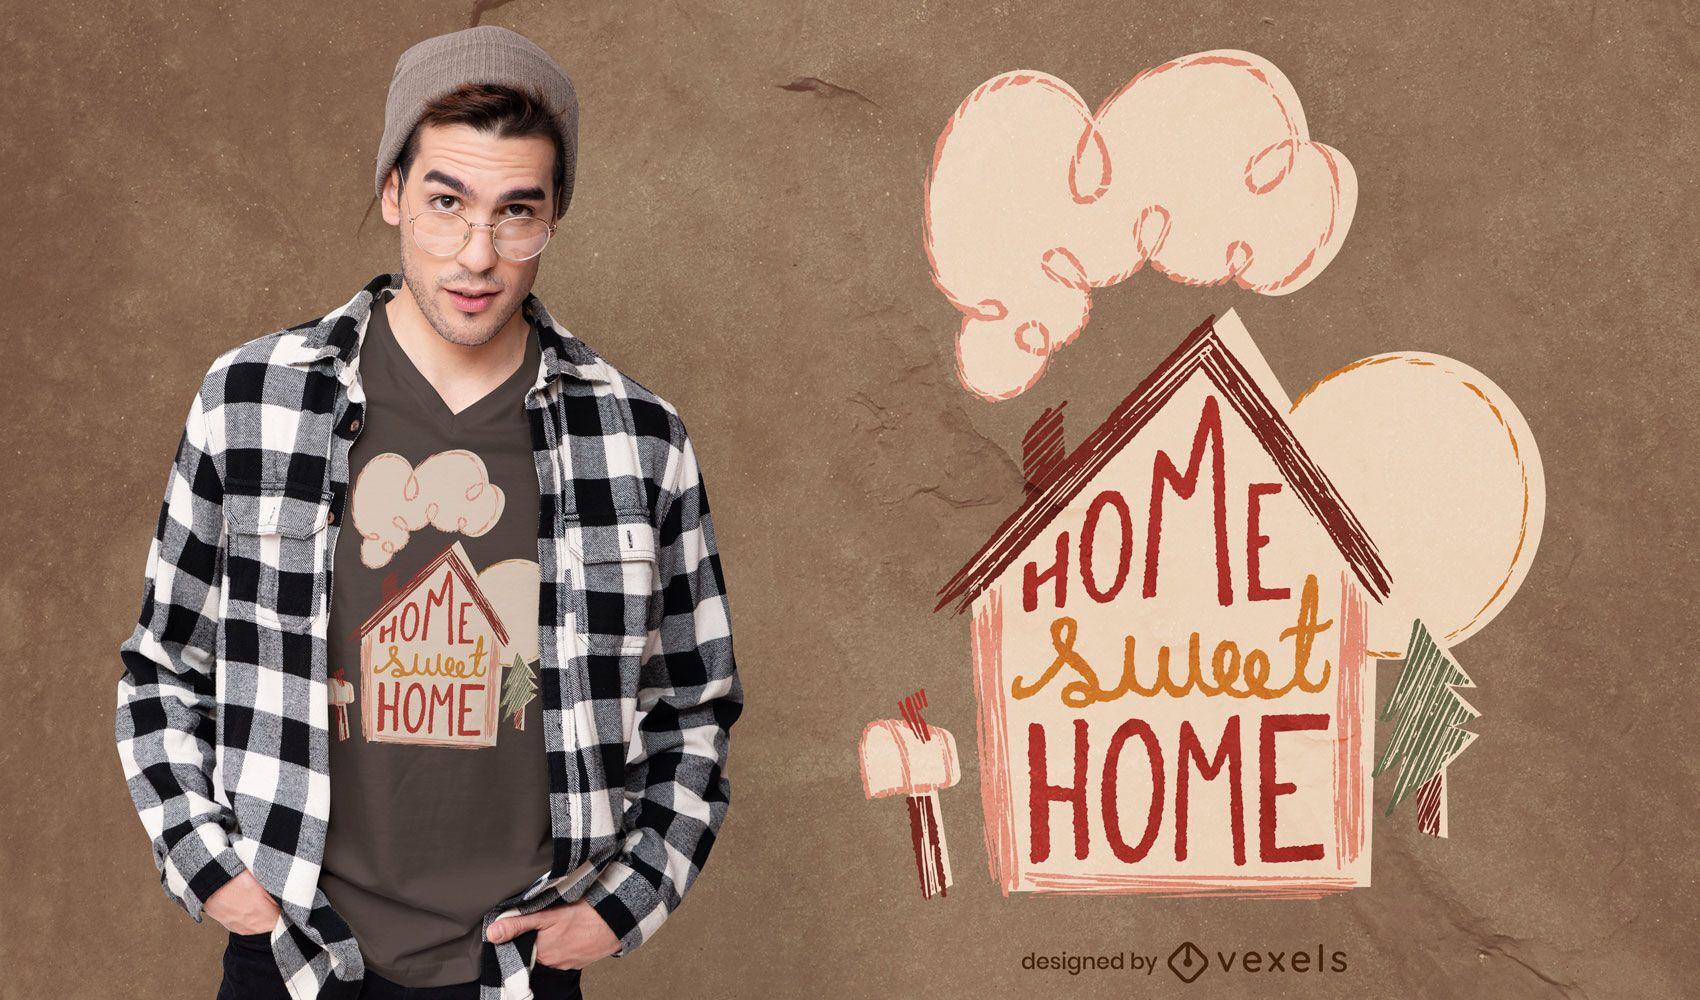 Dise?o de camiseta hogar dulce hogar